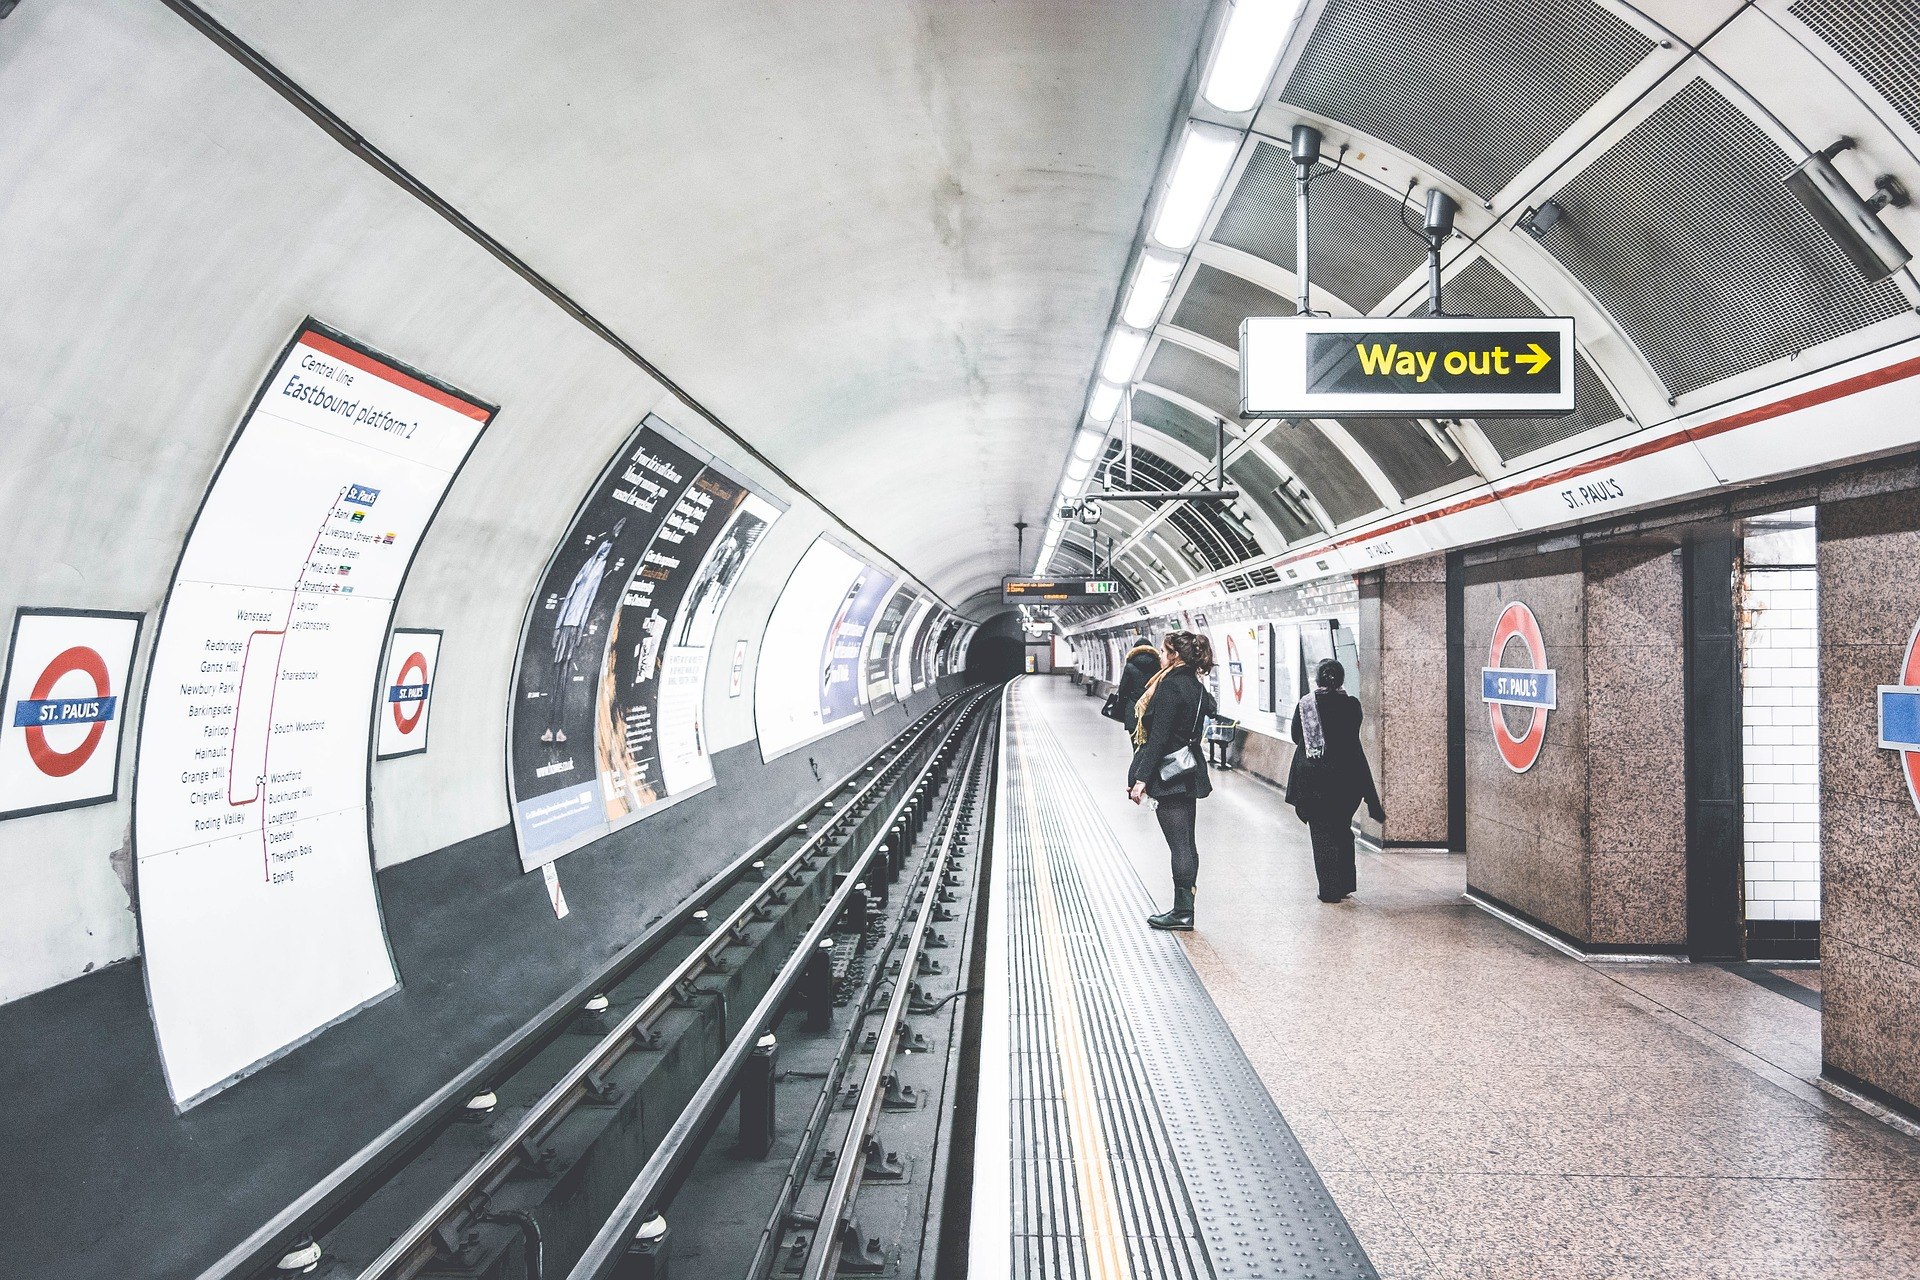 Metropolitana, Londra, Stazione, Inghilterra, Anden, in attesa per voi - Sfondi HD - Professor-falken.com